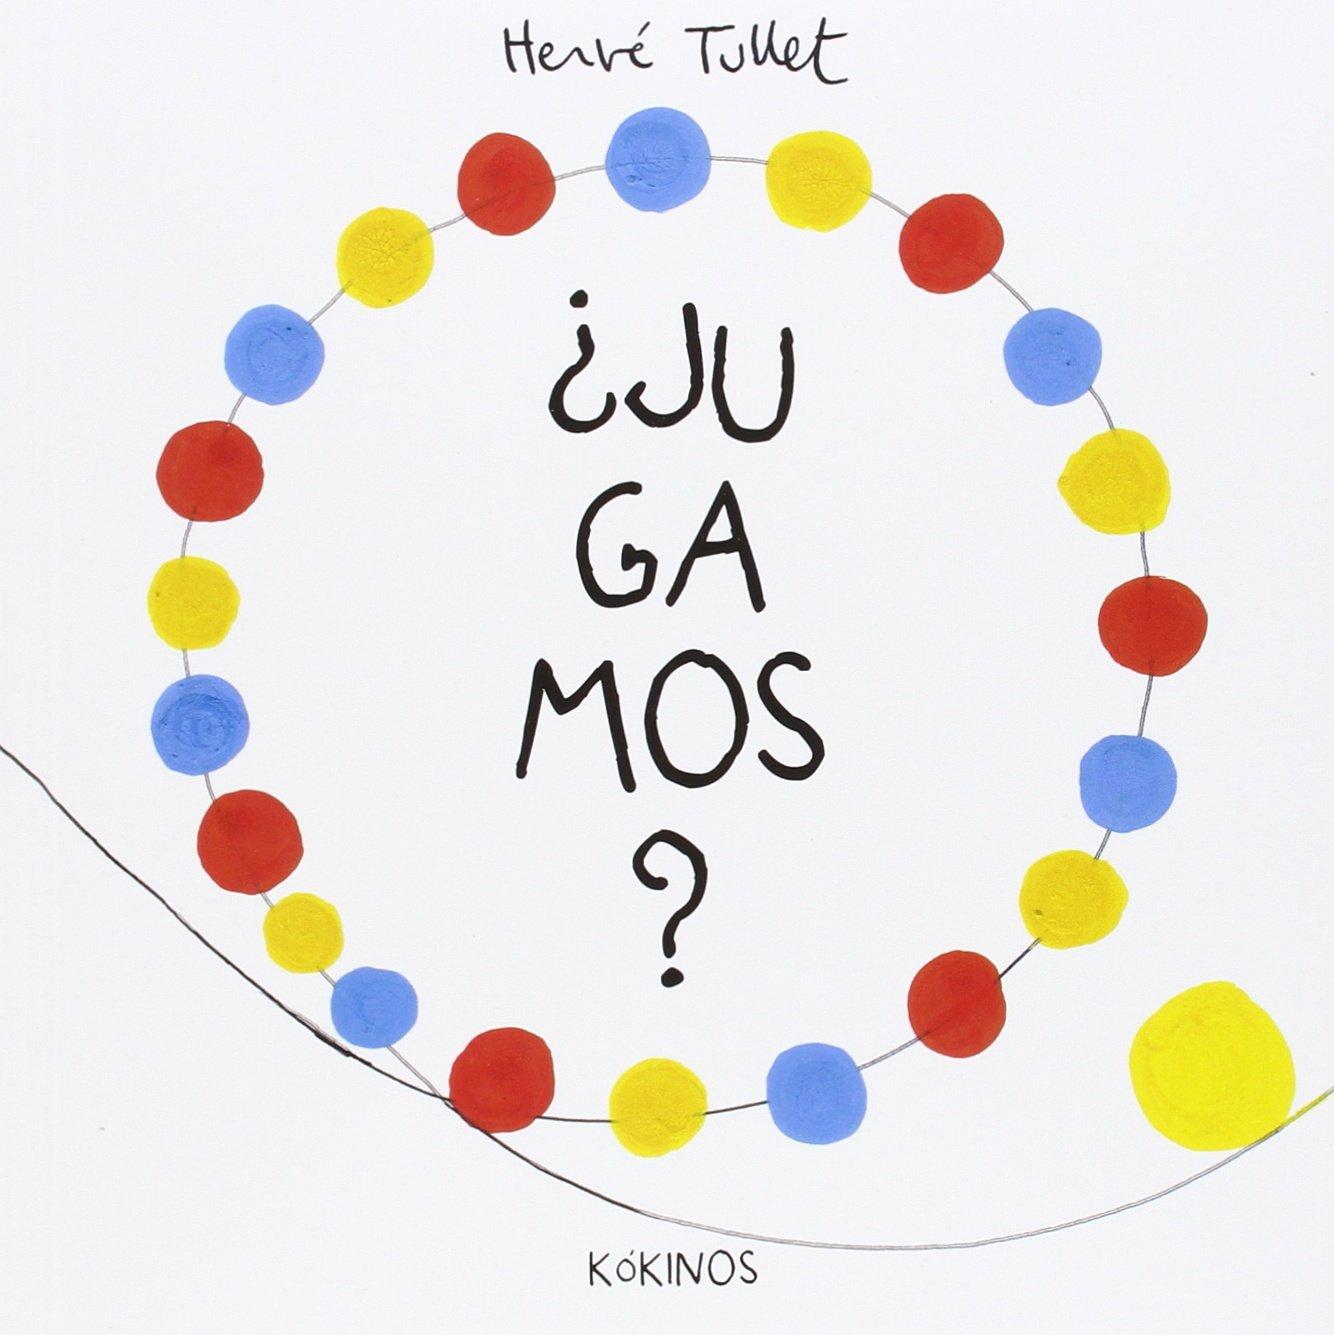 Amazon.es: Hervé Tullet, Esther Rubio Muñoz: Libros